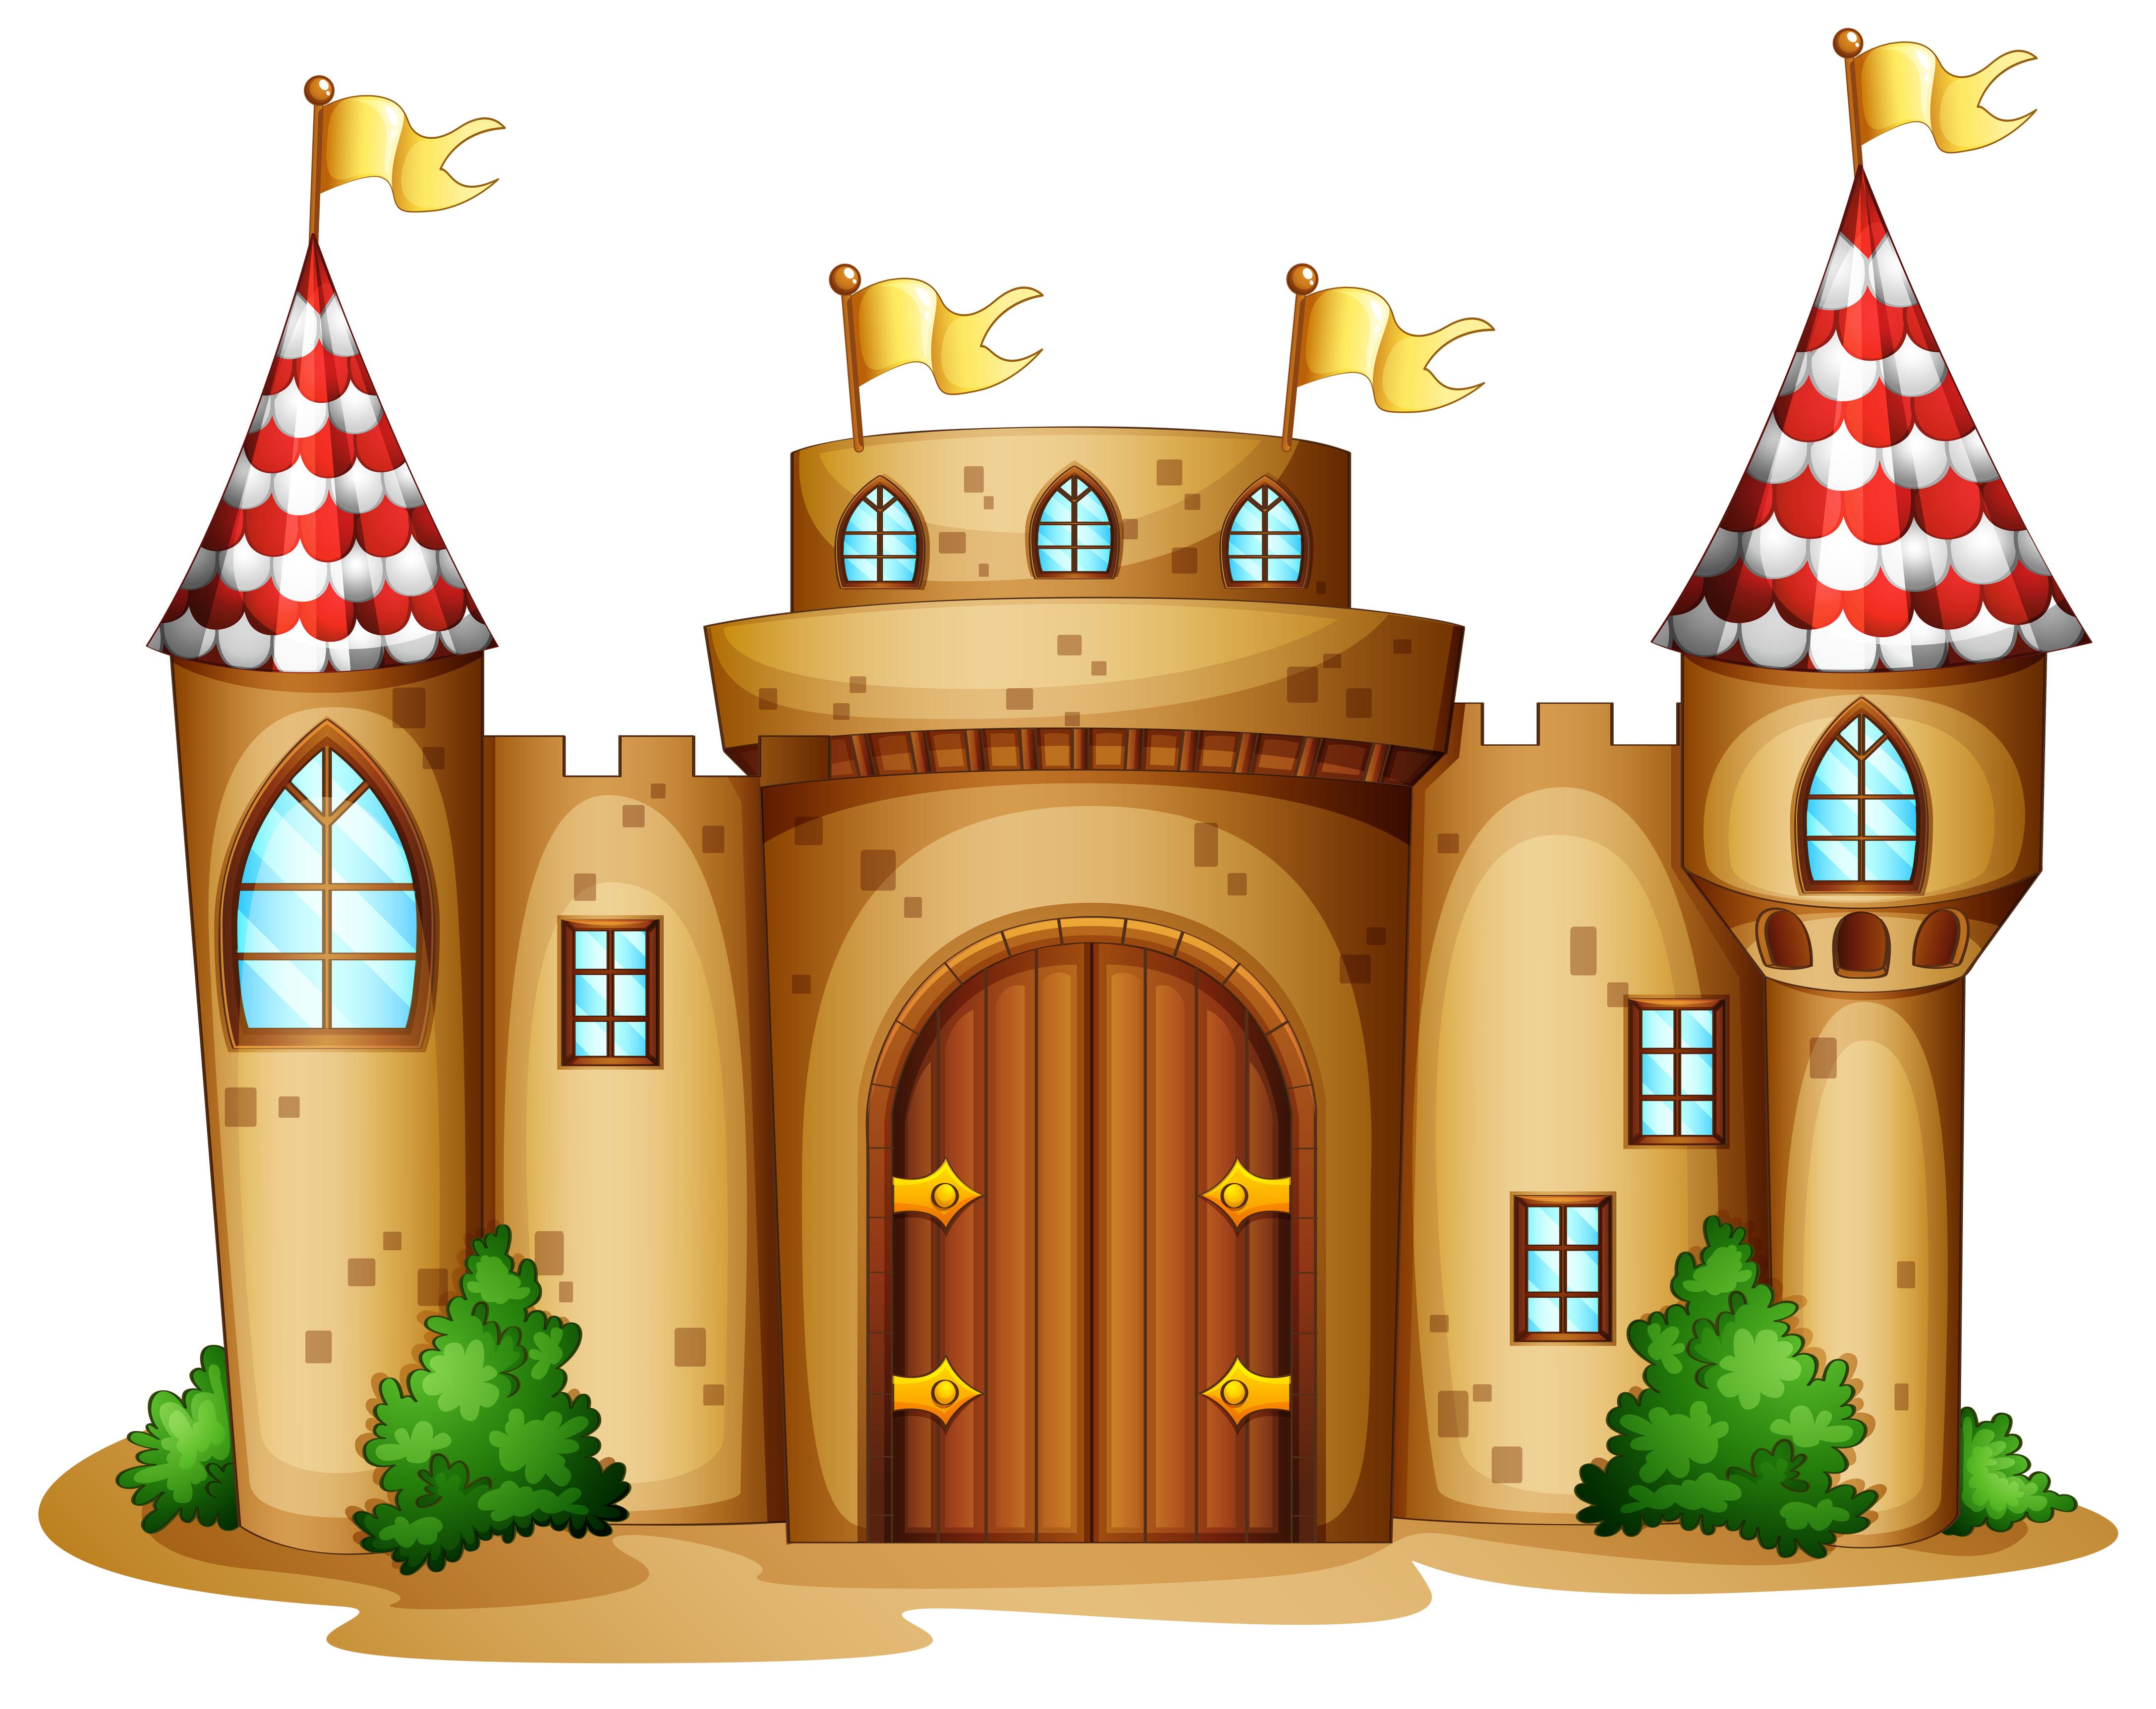 Castle cartoon clipart vector library Free Cartoon Castle, Download Free Clip Art, Free Clip Art on ... vector library